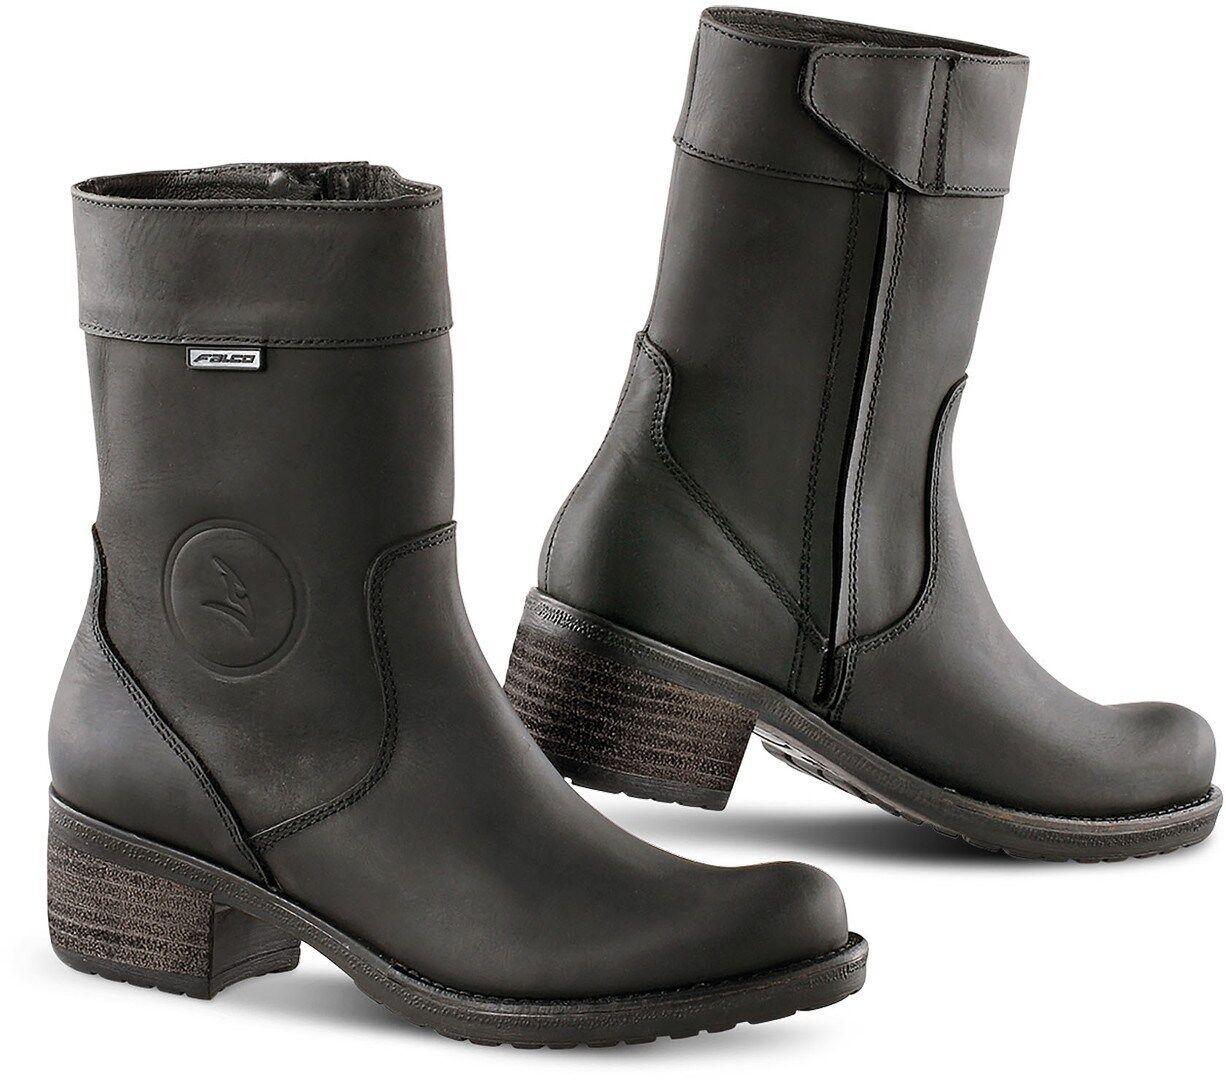 Falco Ayda 2 Ladies Motorcycle Boots Black 38